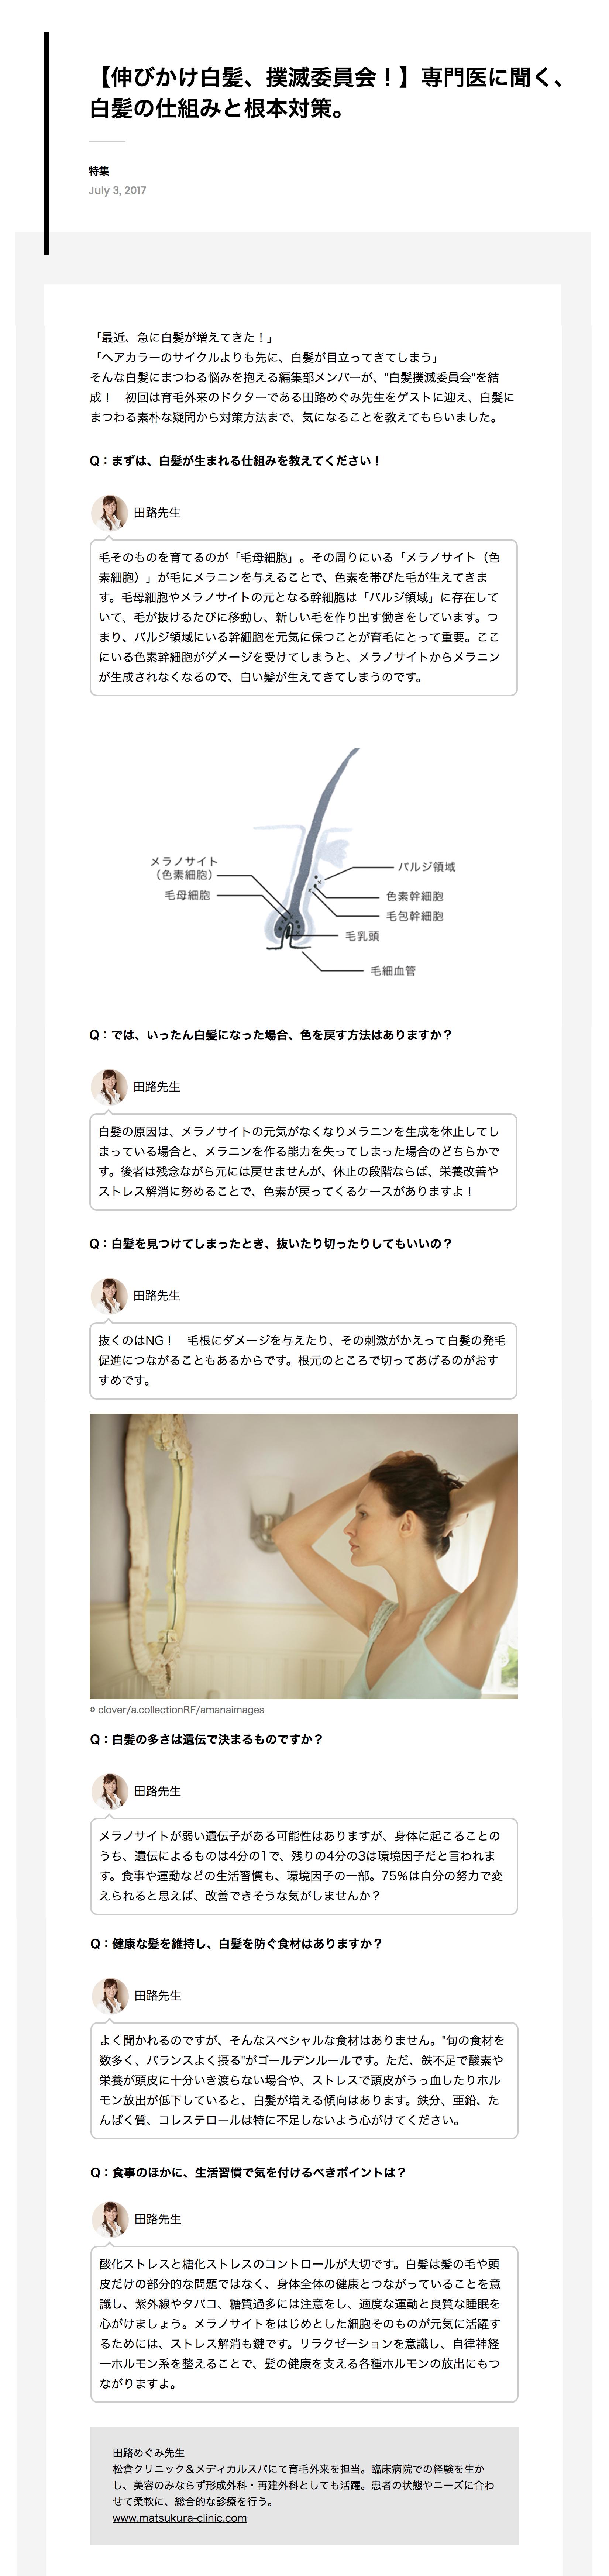 madame Figaro.jp 2017年7月3日掲載